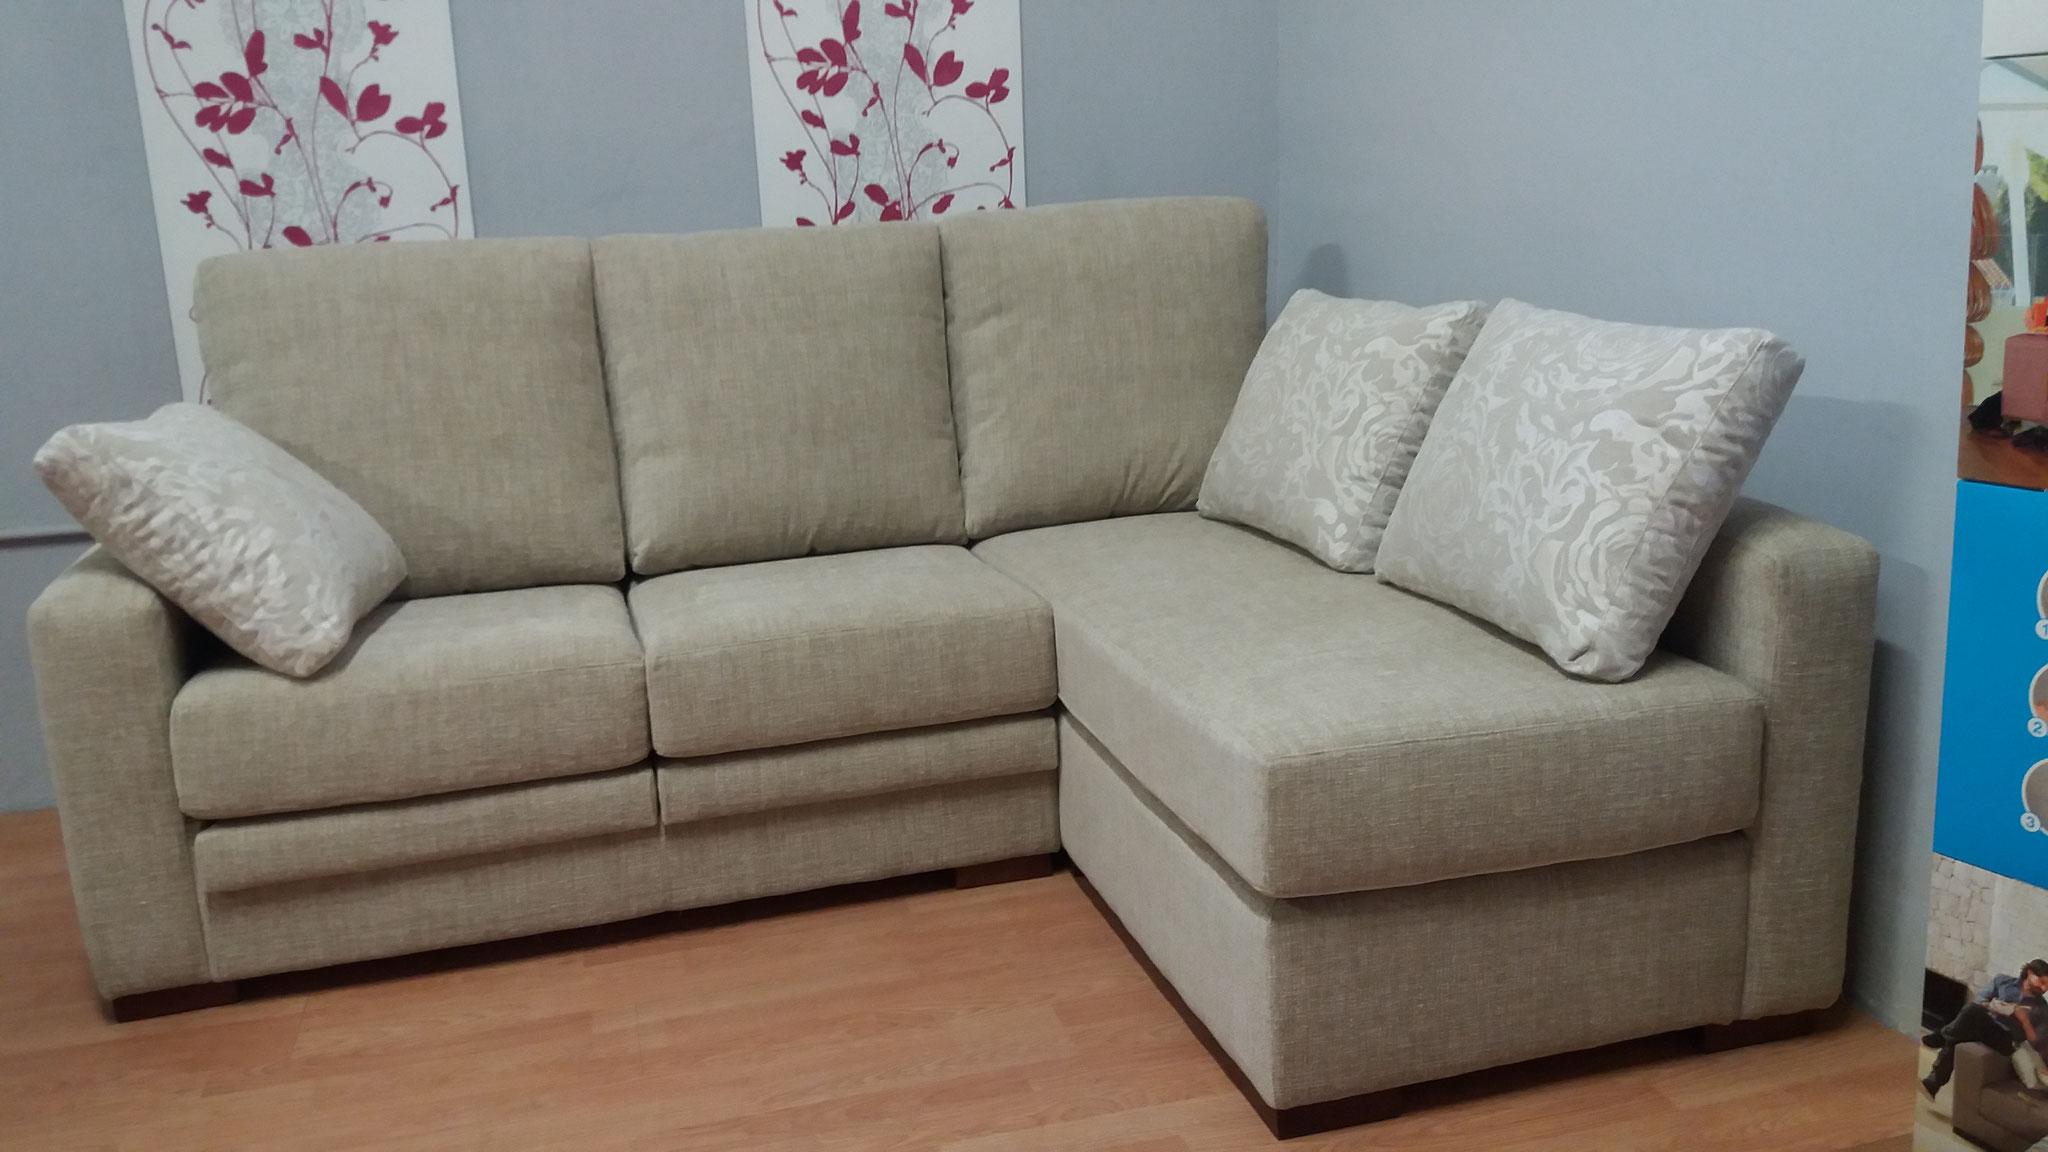 Sofas chaise longue - EntreSofas - Sofas Valladolid